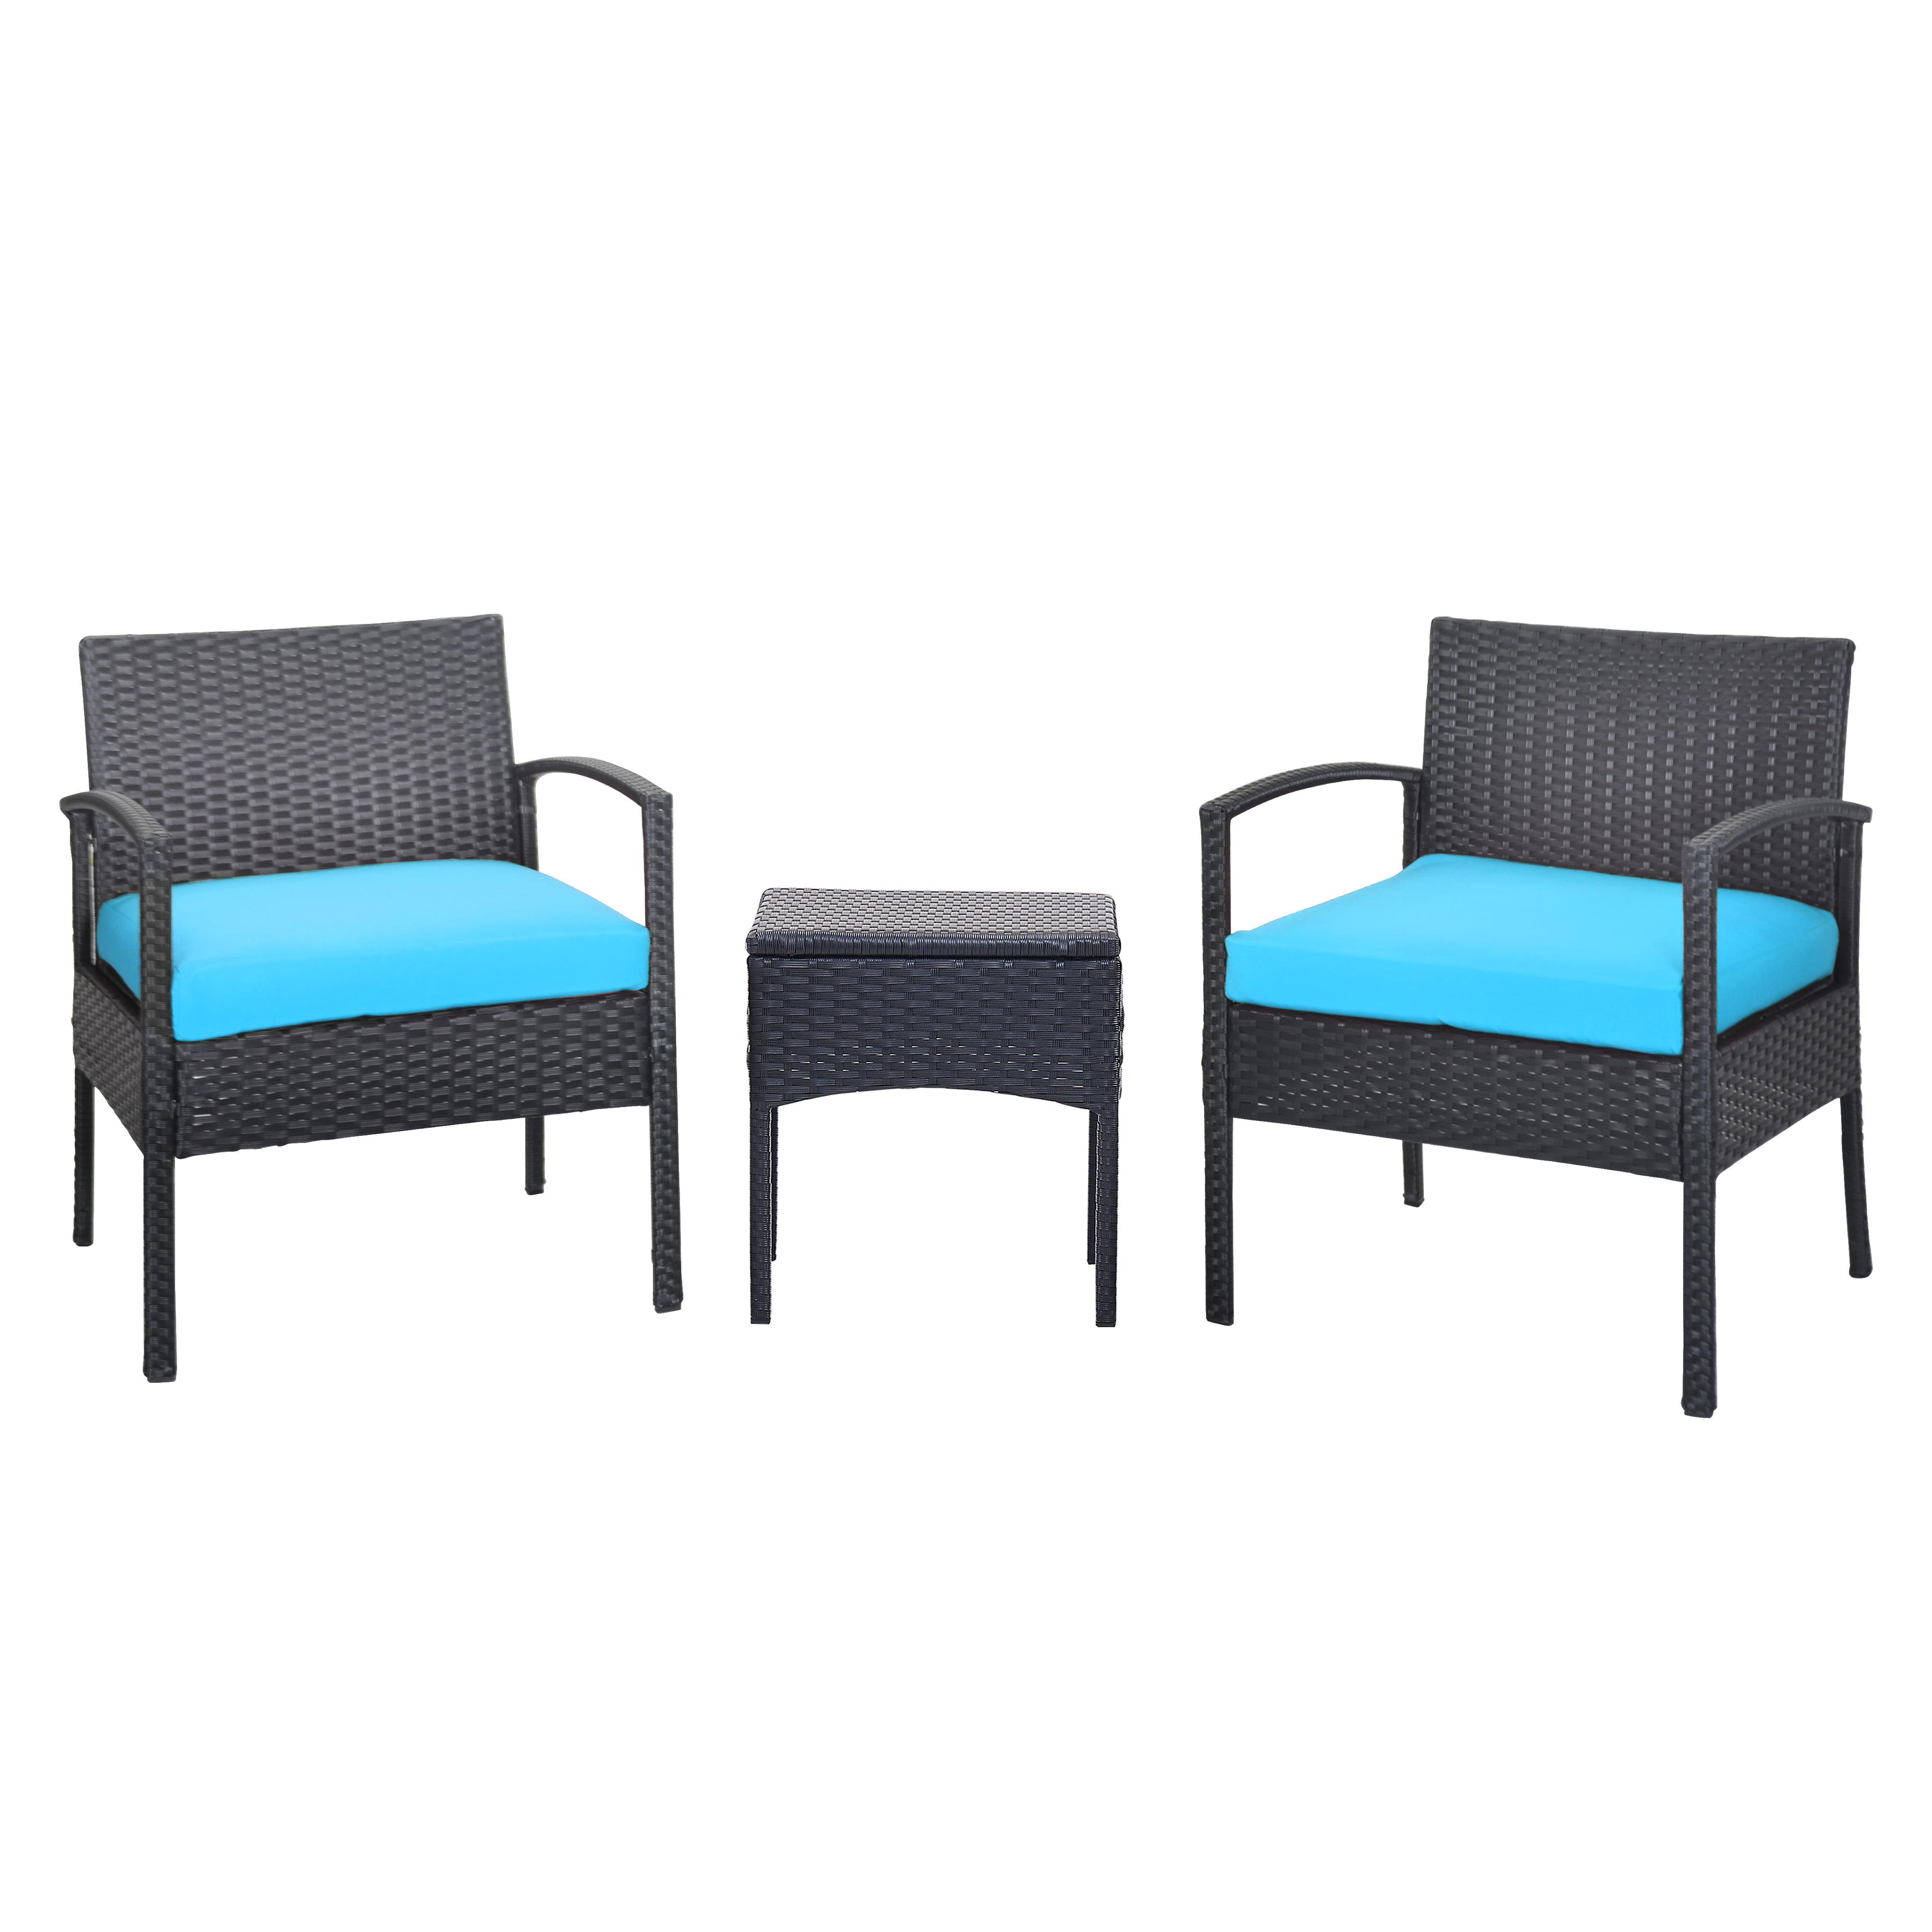 Daytona 3-Piece Seating Set, Black Wicker Rattan, Red Cushions